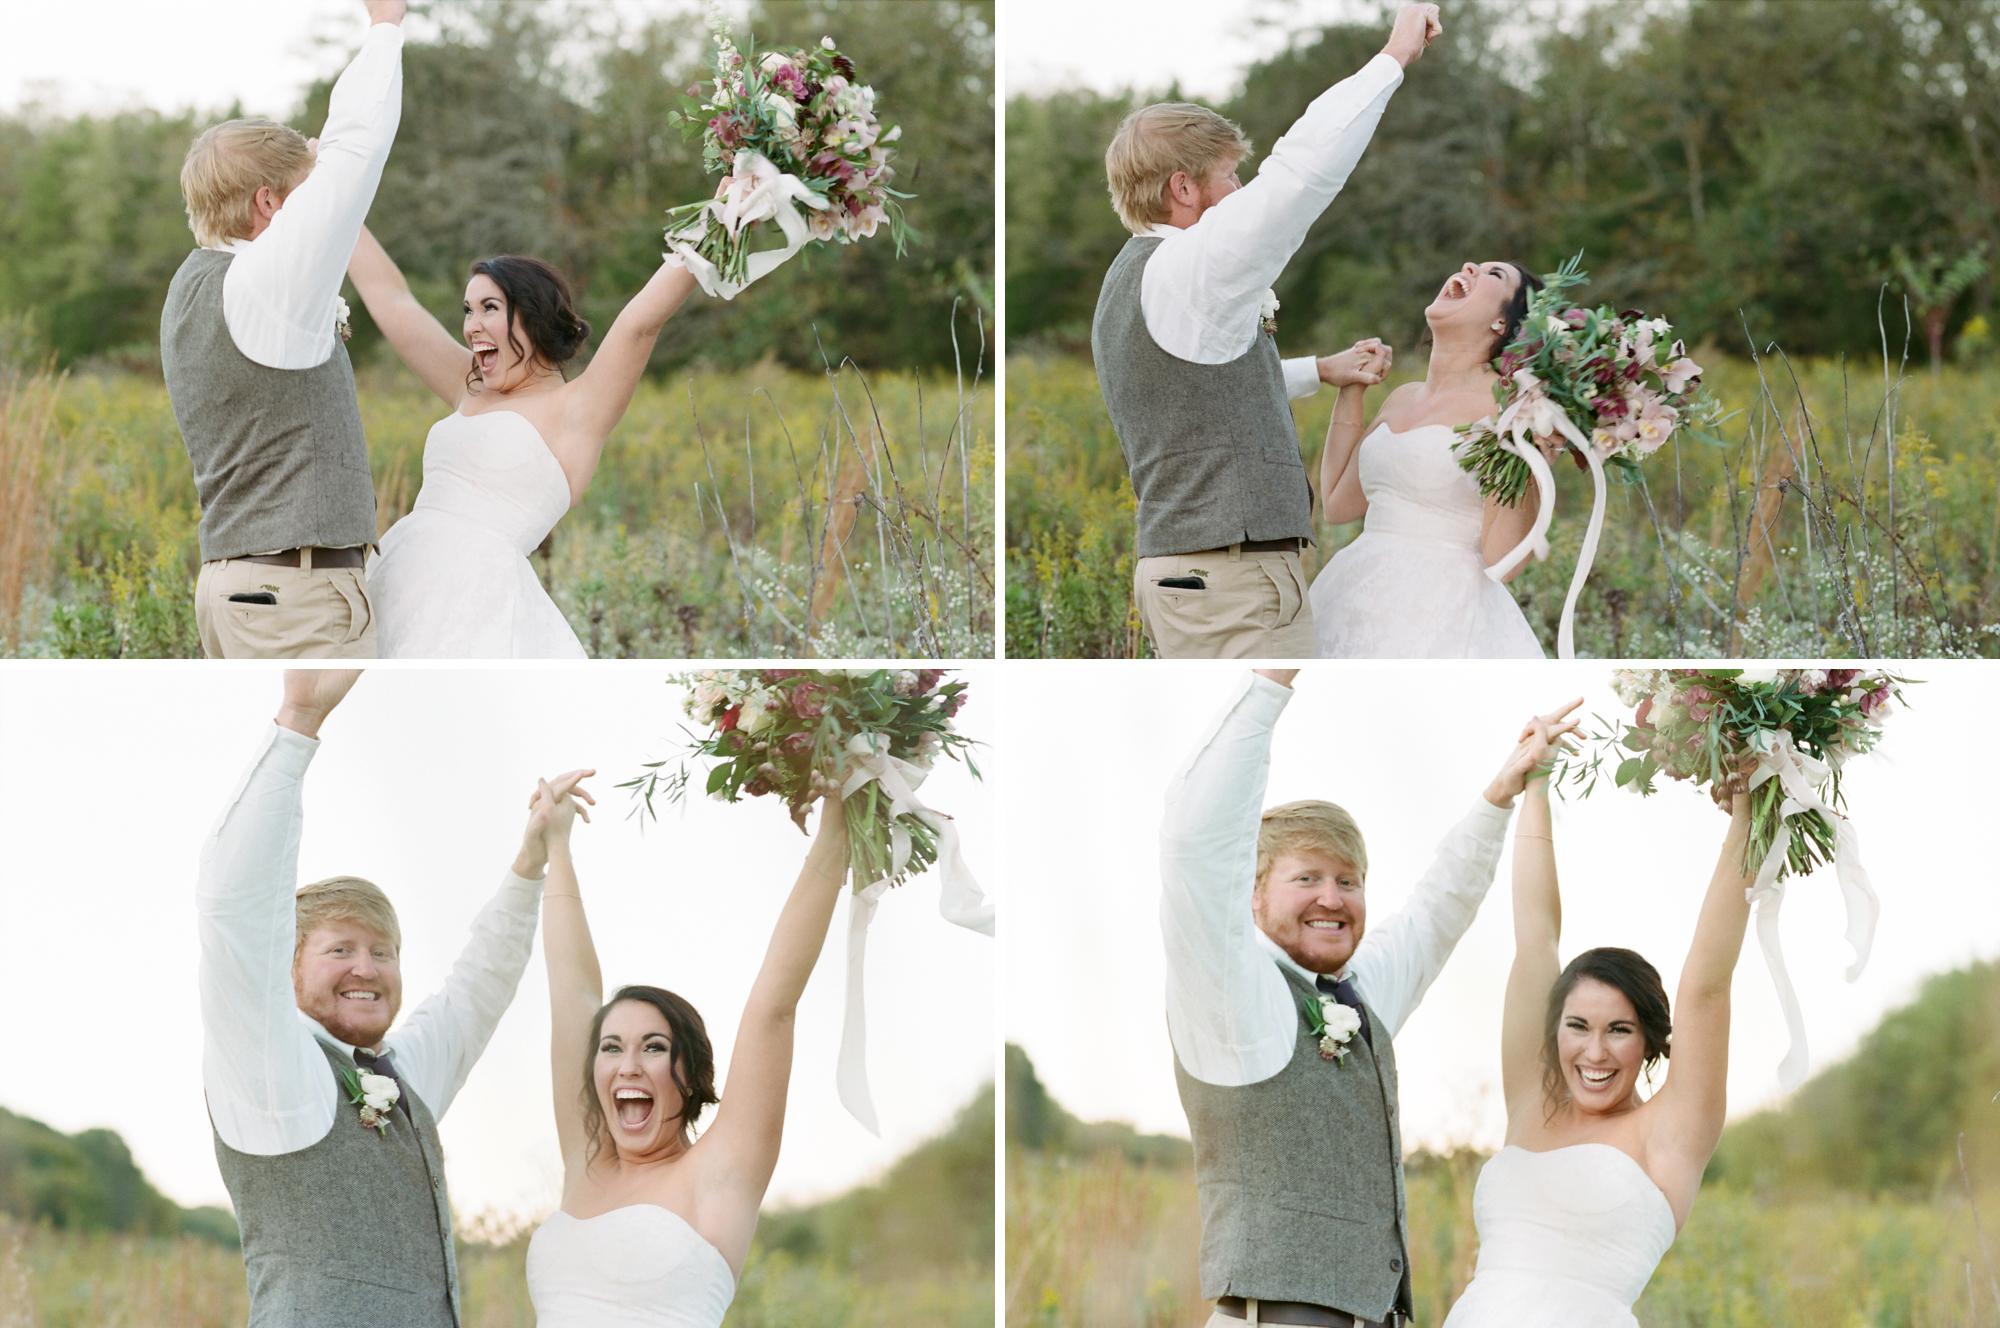 southern-weddings-film-photographer_0053.jpg